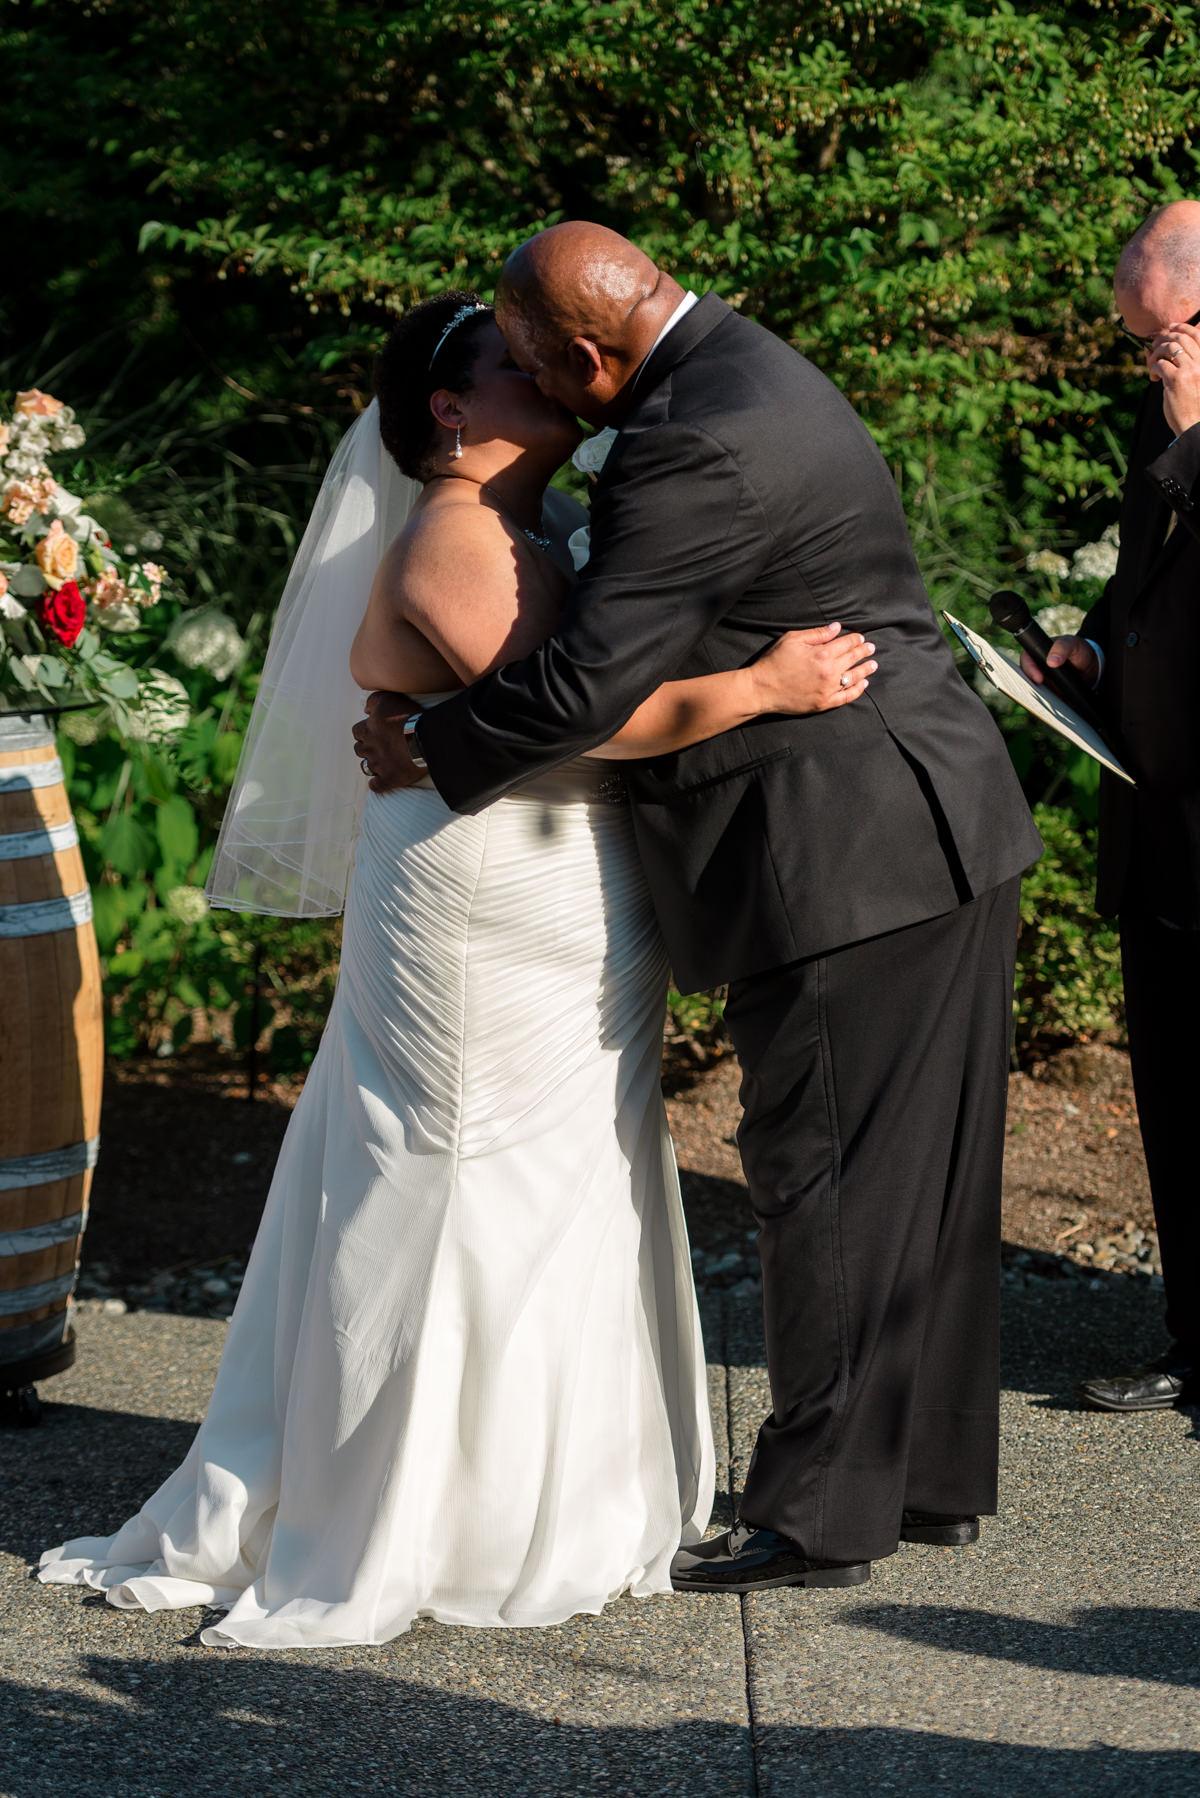 Andrew Tat - Documentary Wedding Photography - Columbia Winery - Woodinville, Washington -Patricia & Teffin - 15.jpg